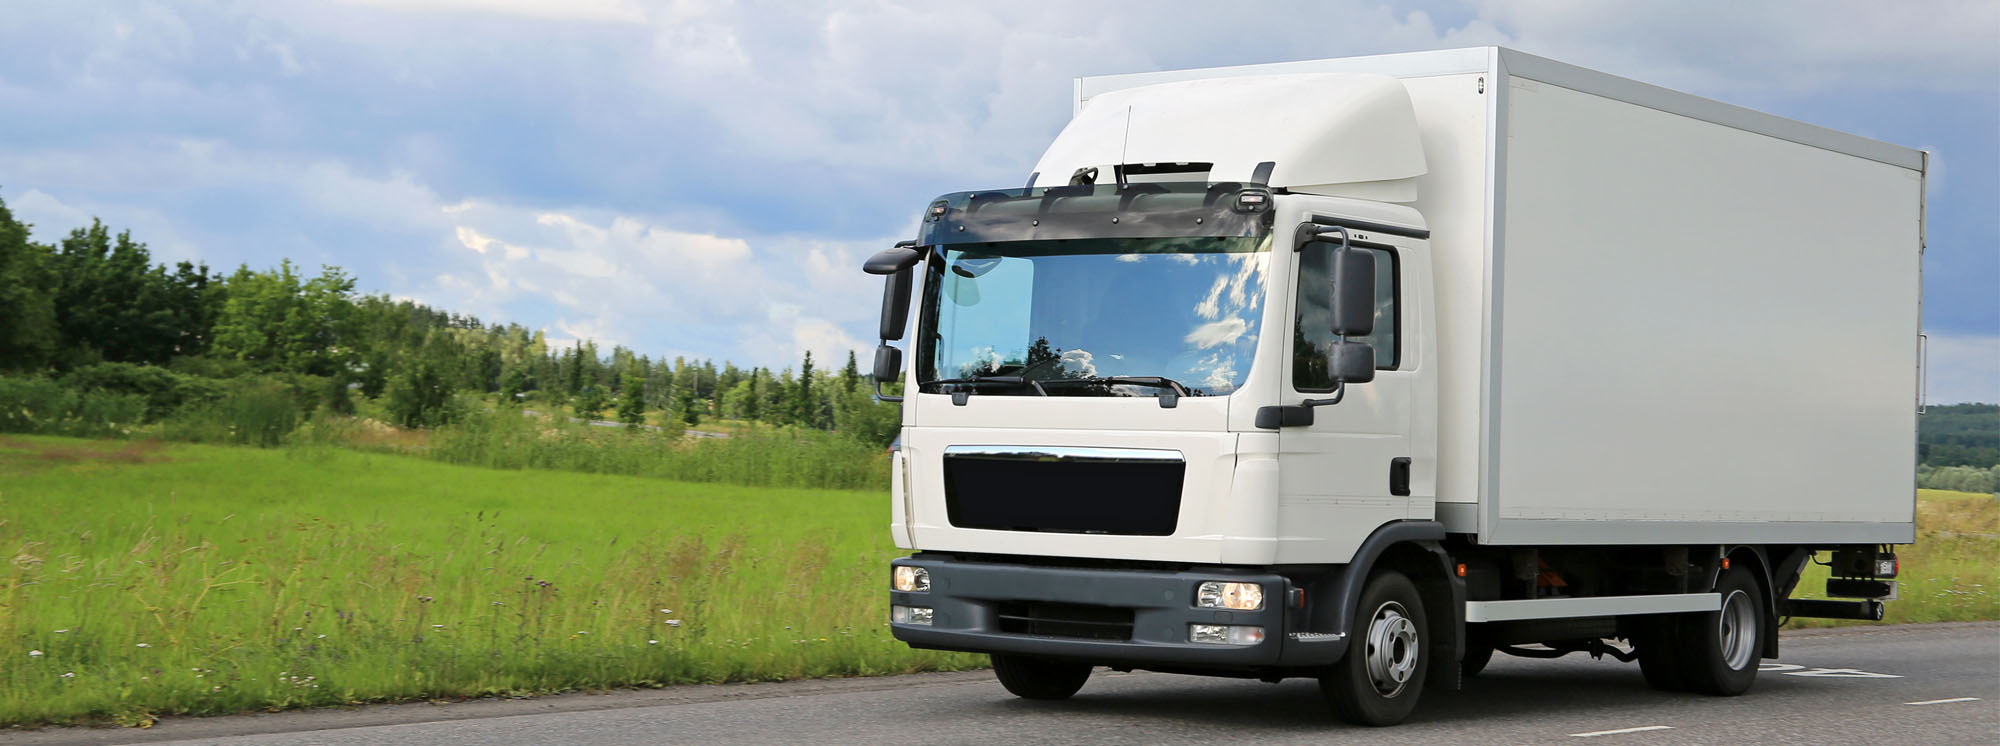 LKW Header Ebner Transporte